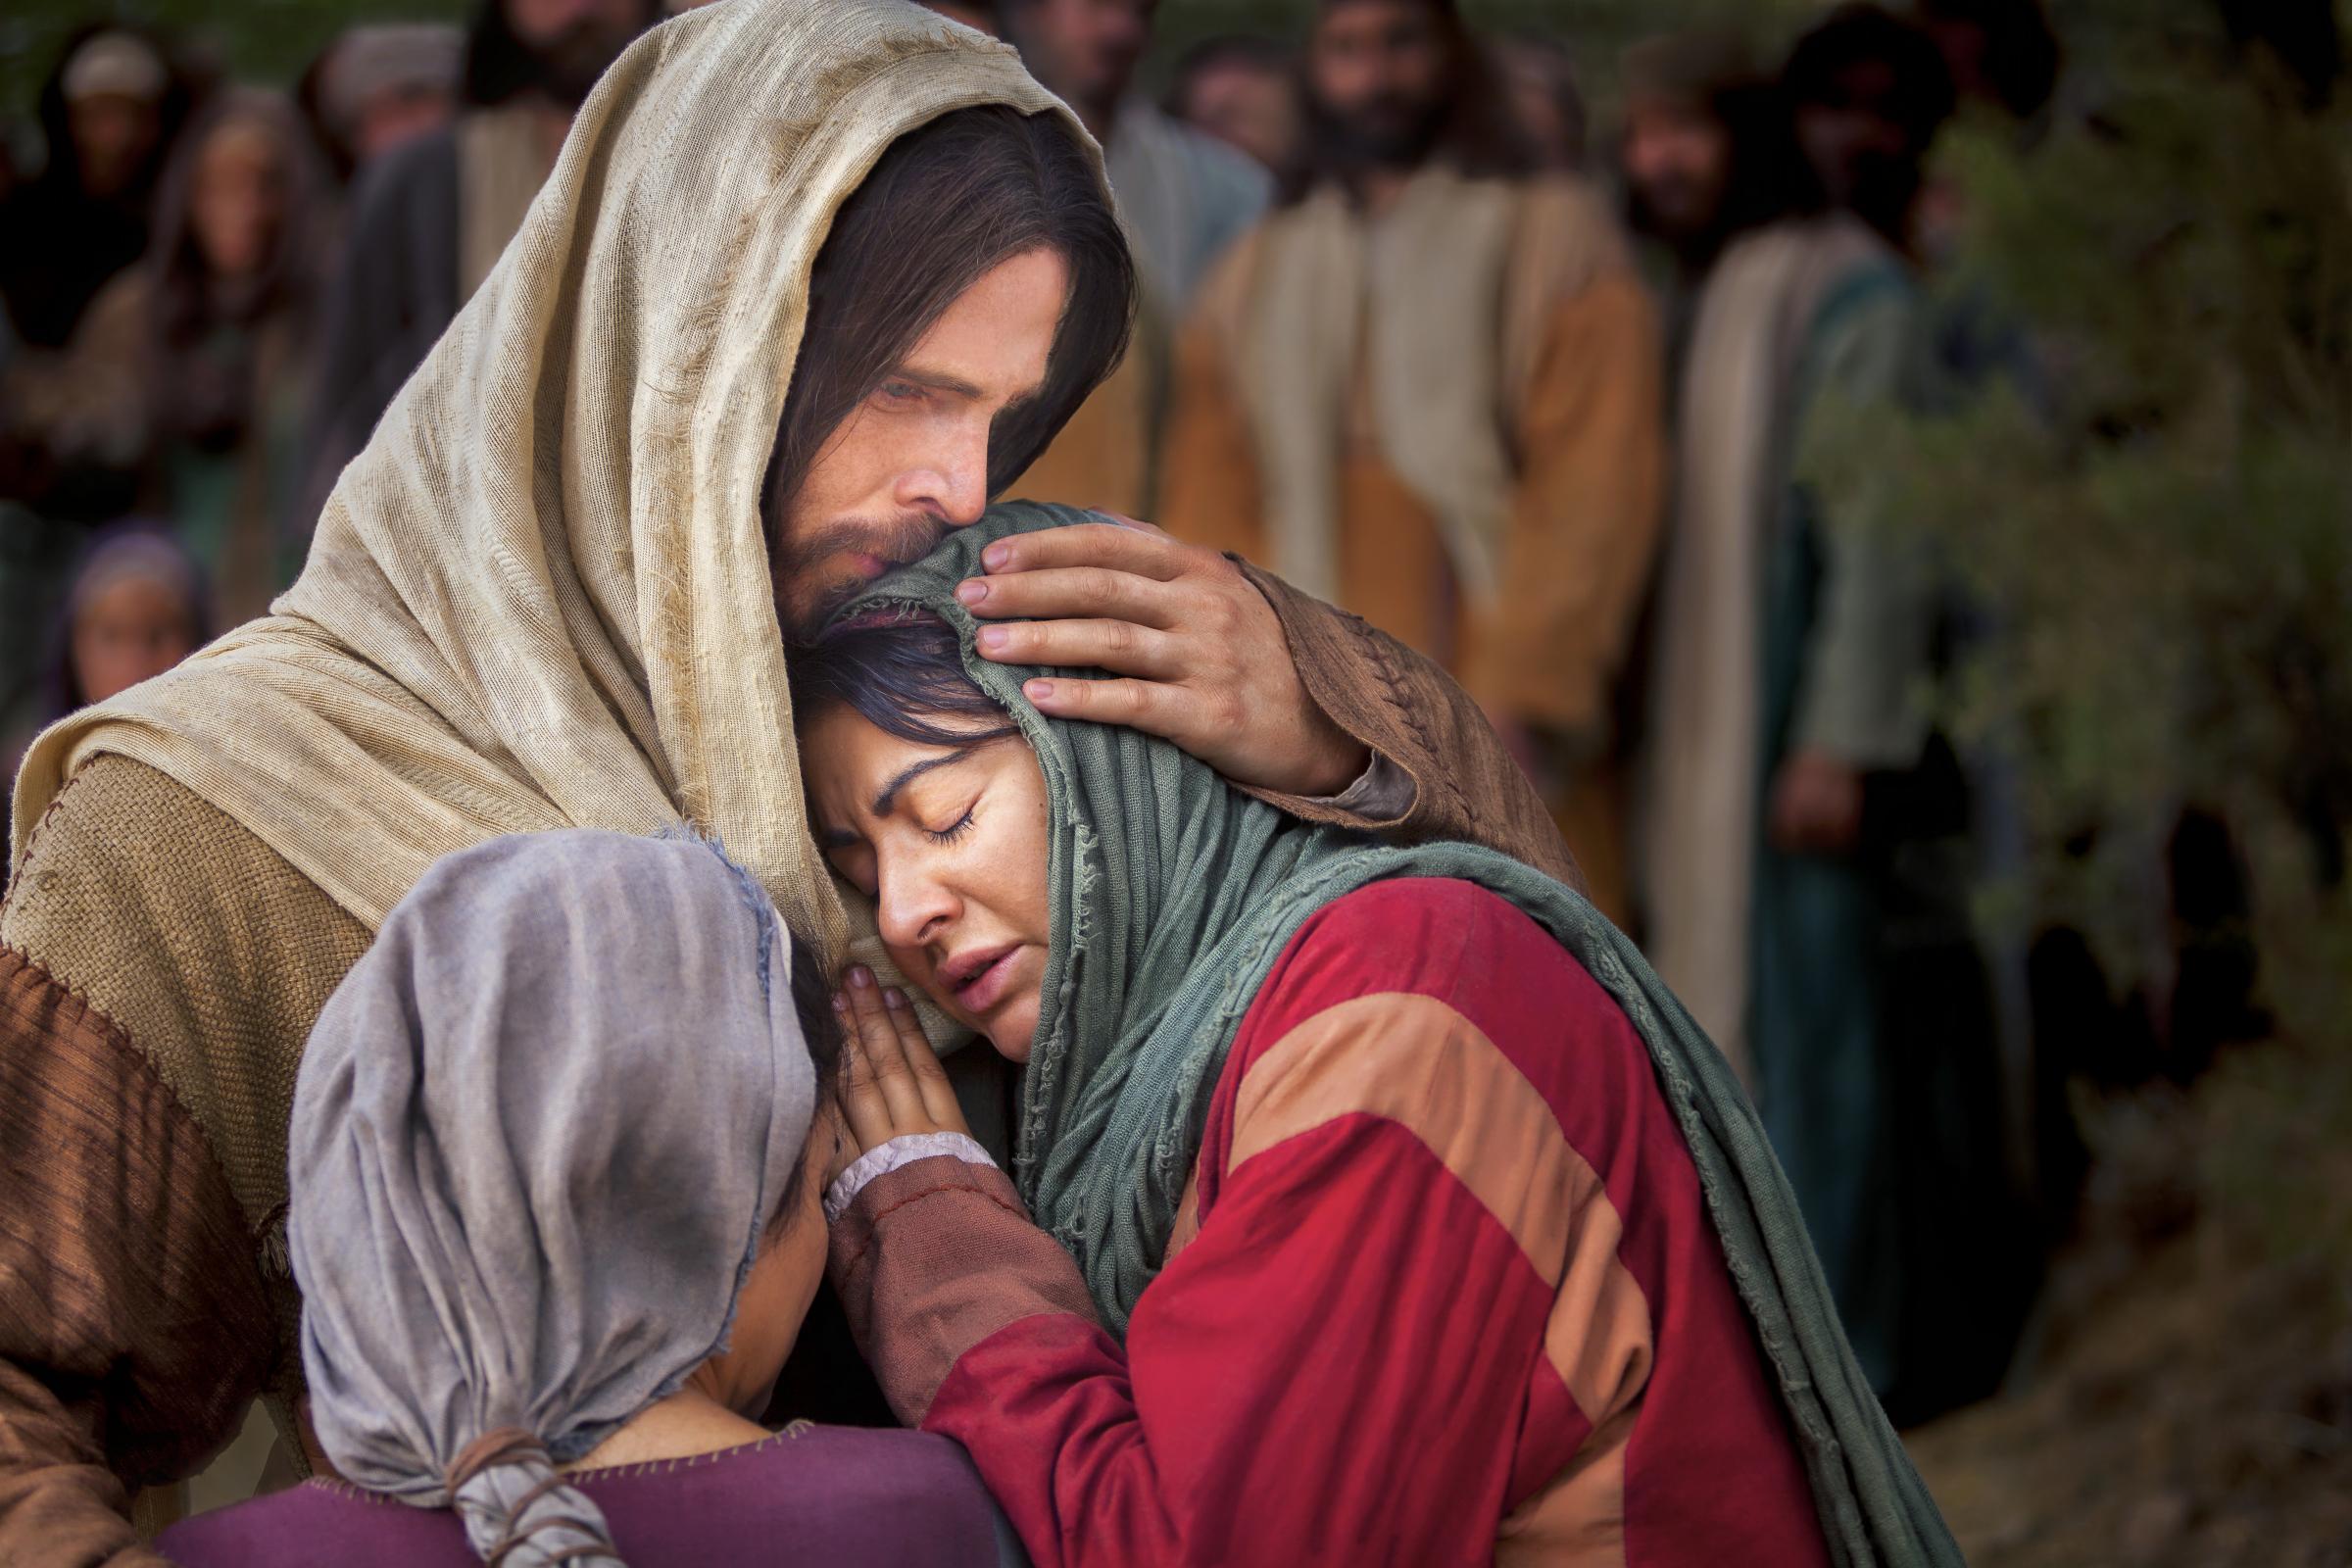 Jesus Christ and Mary - Parafia Radzymin